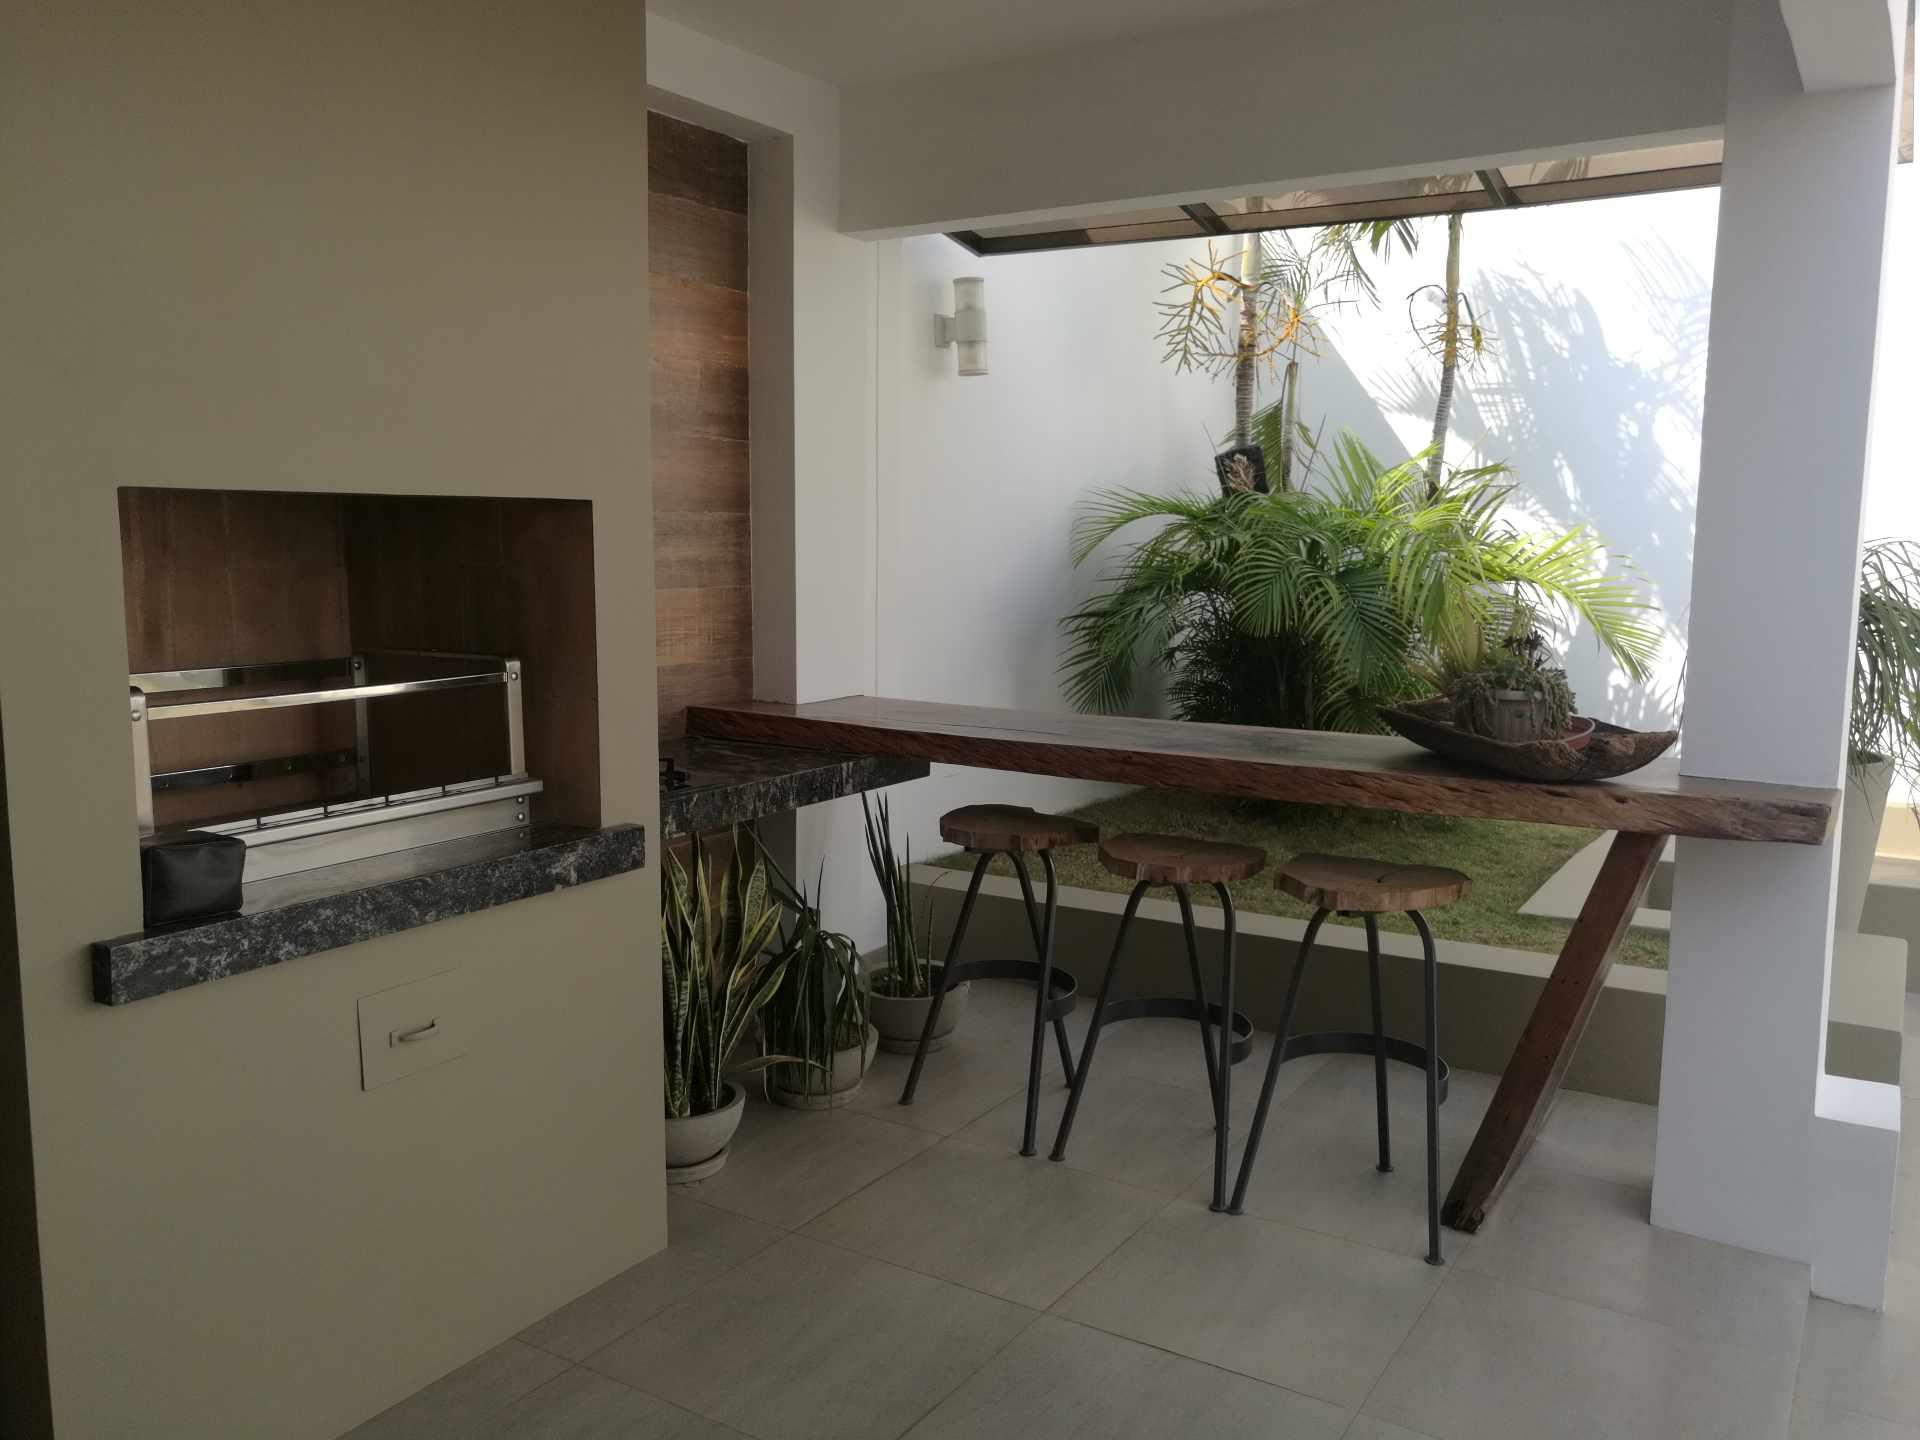 Casa en Venta Condominio La Hacienda I 5to anillo entre Av Cristo Redentor y Av. Beni Foto 7